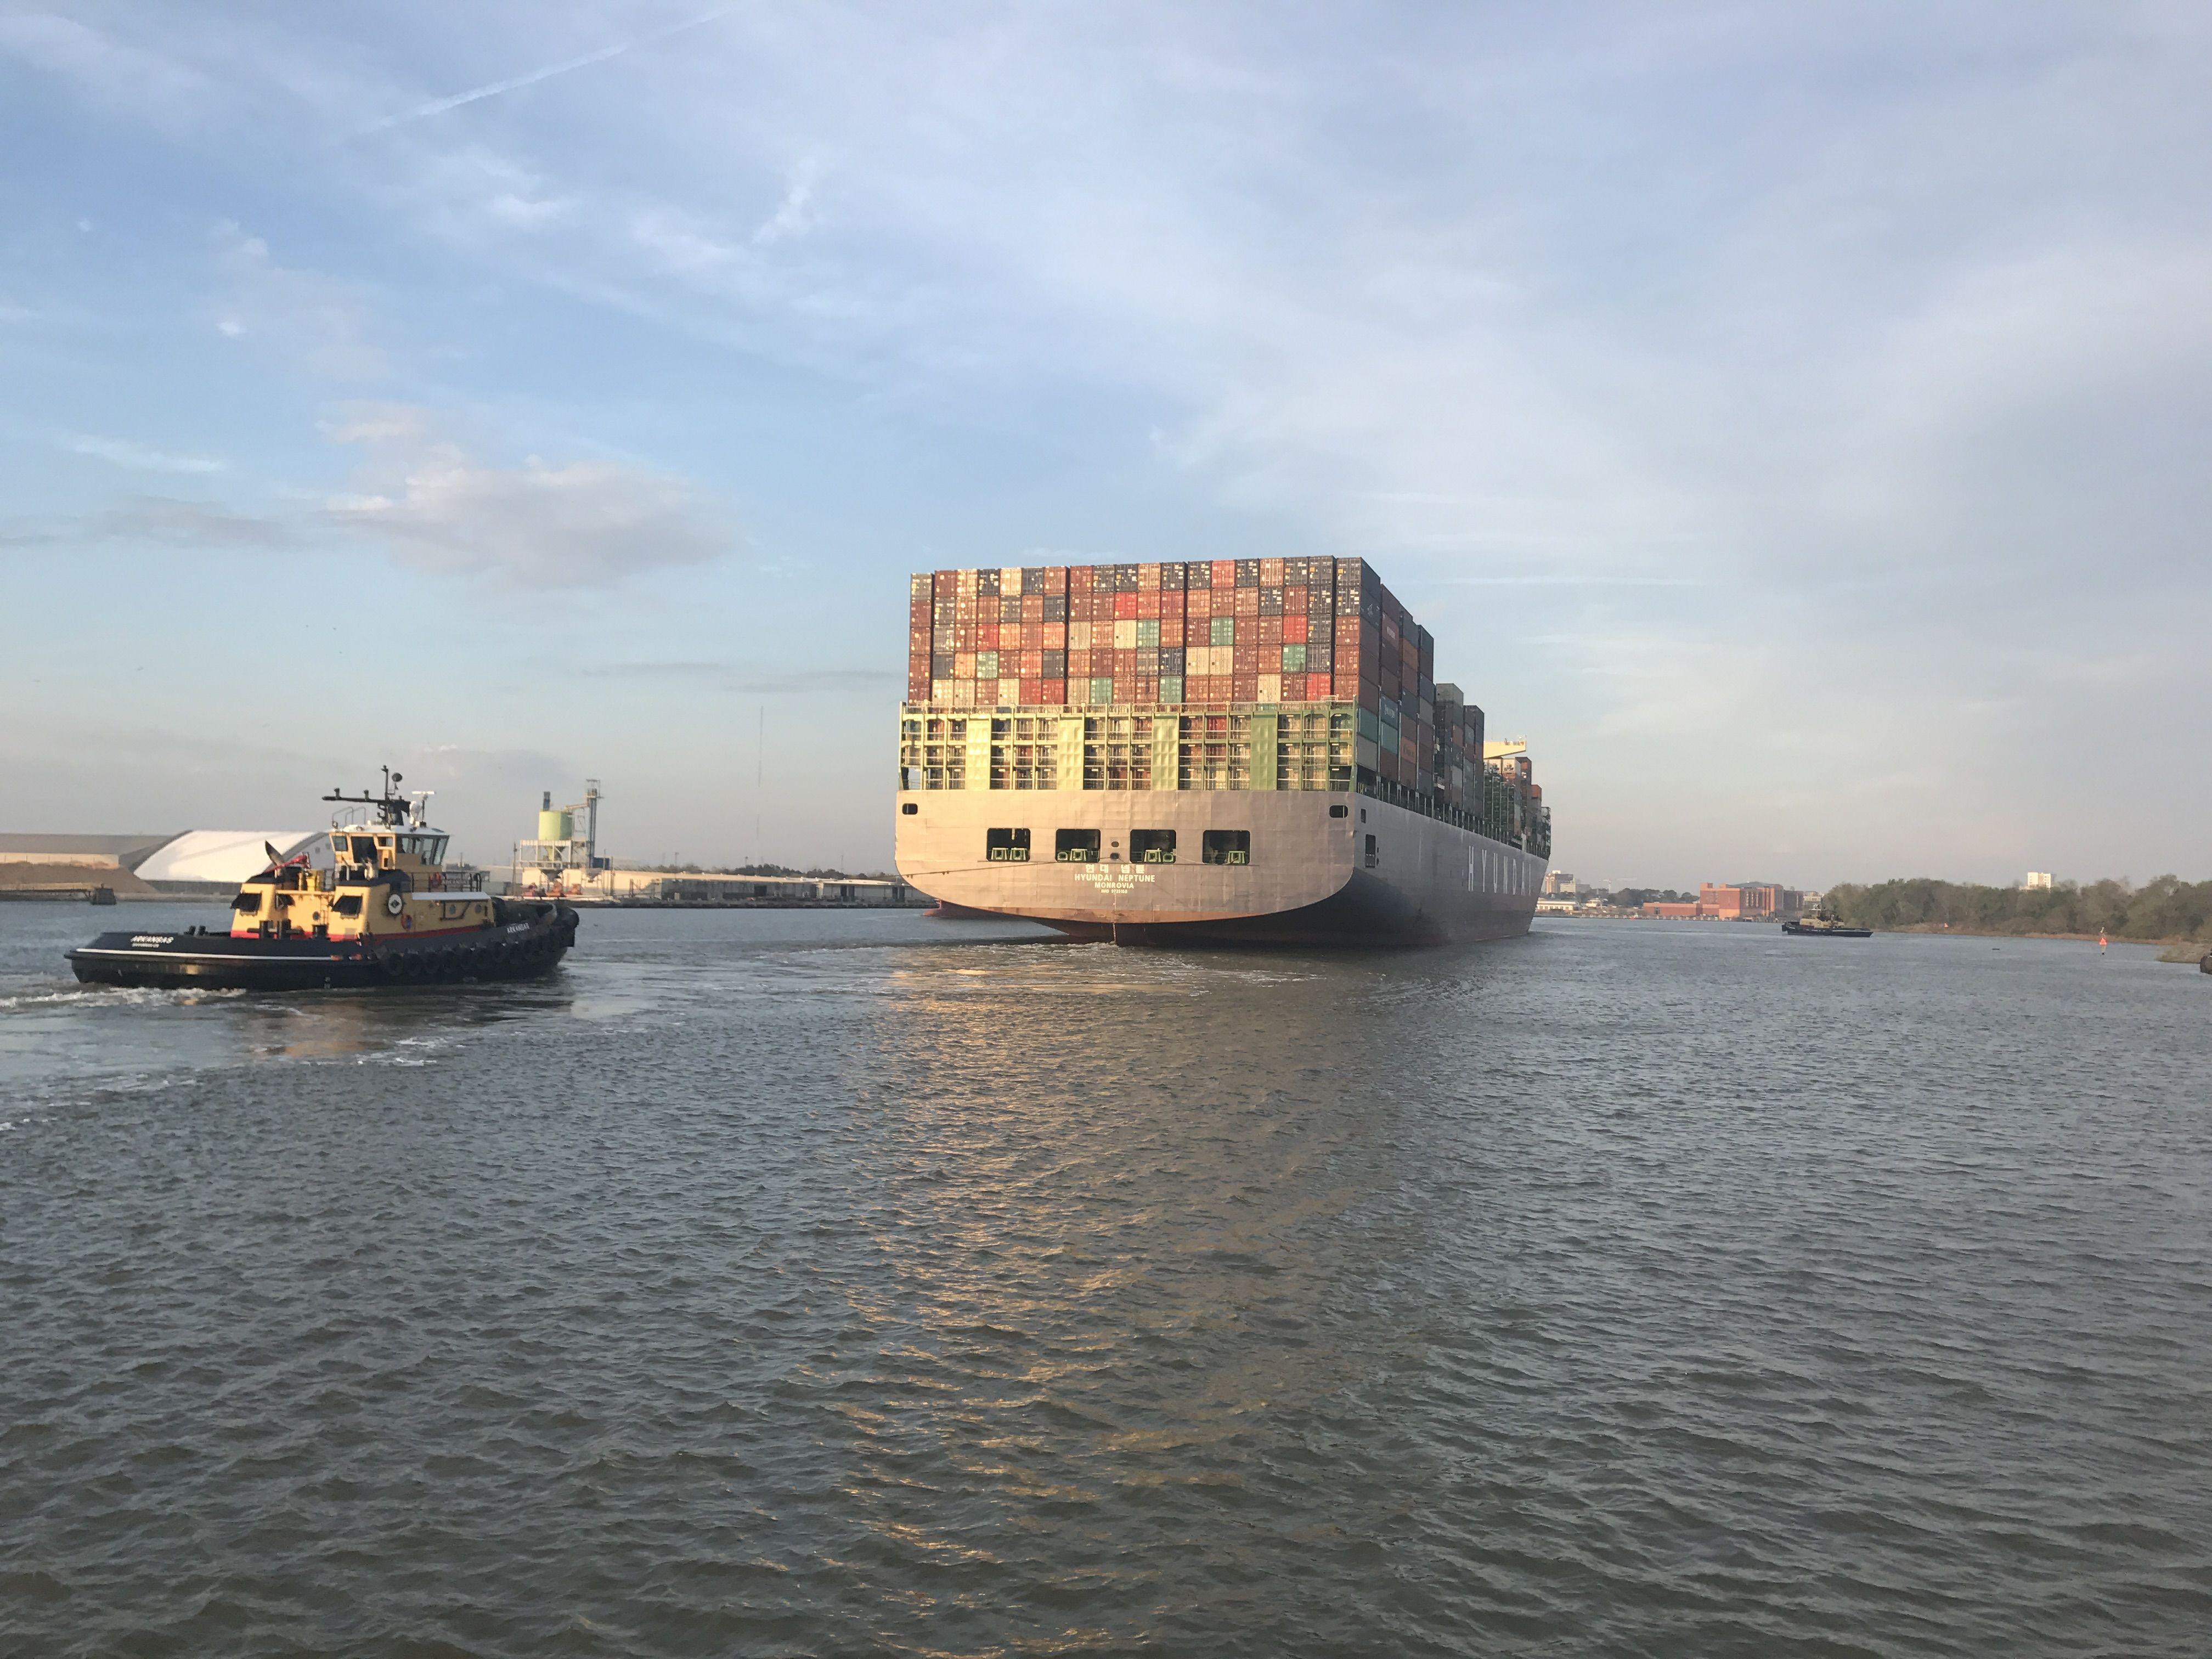 Savannah, GA two ships passing in the Savannah River  One